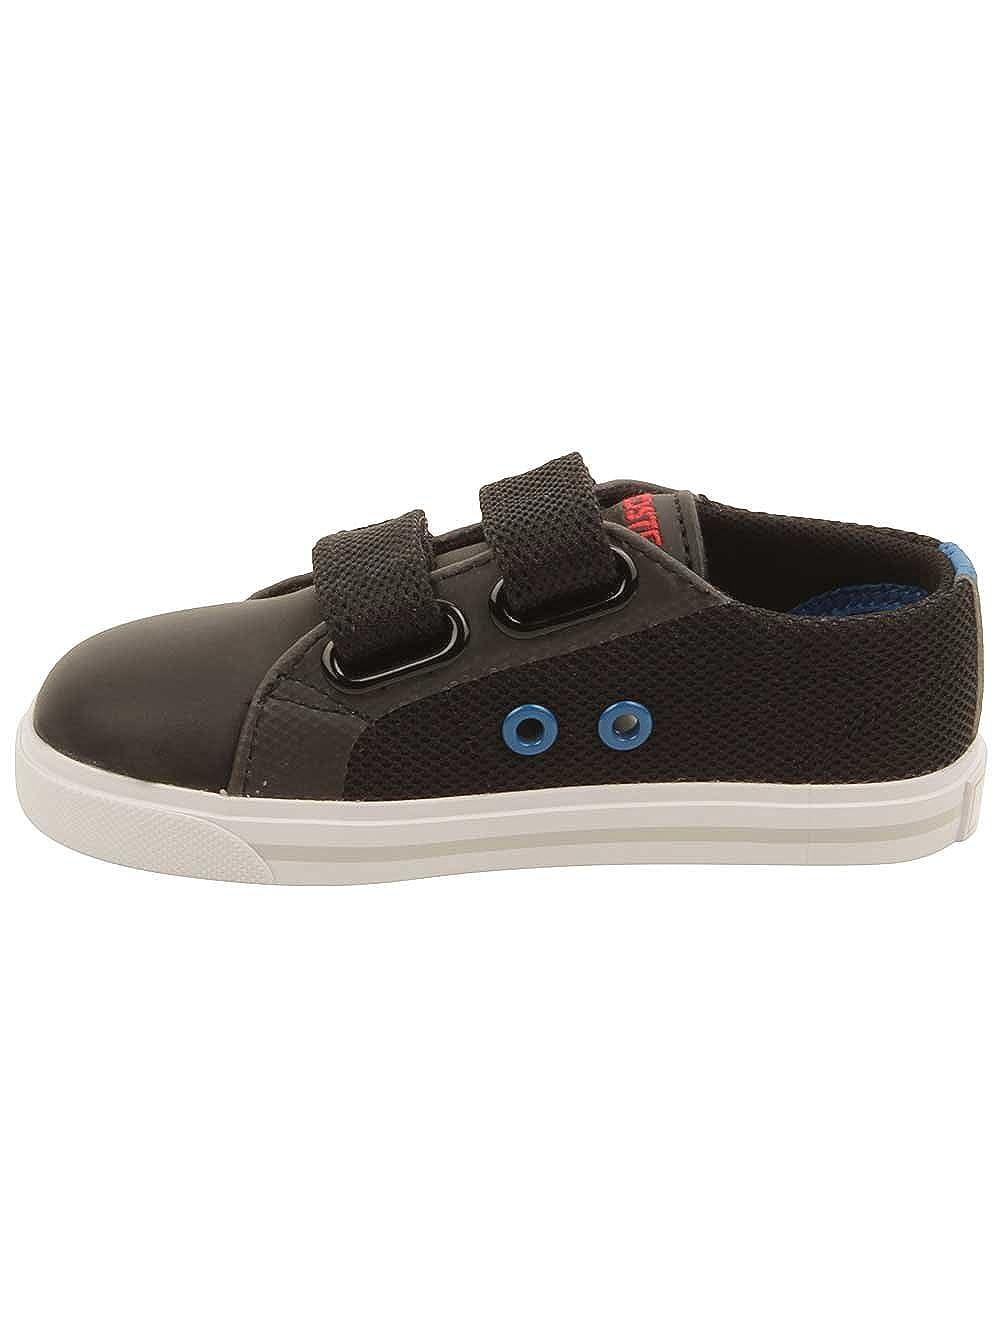 Amazon.com: LACOSTE Marcel 4161 Black/Royal Blue Sneakers 7-32SPI0121024 Infant/Toddler Shoes (4.0 M US Toddler): Shoes